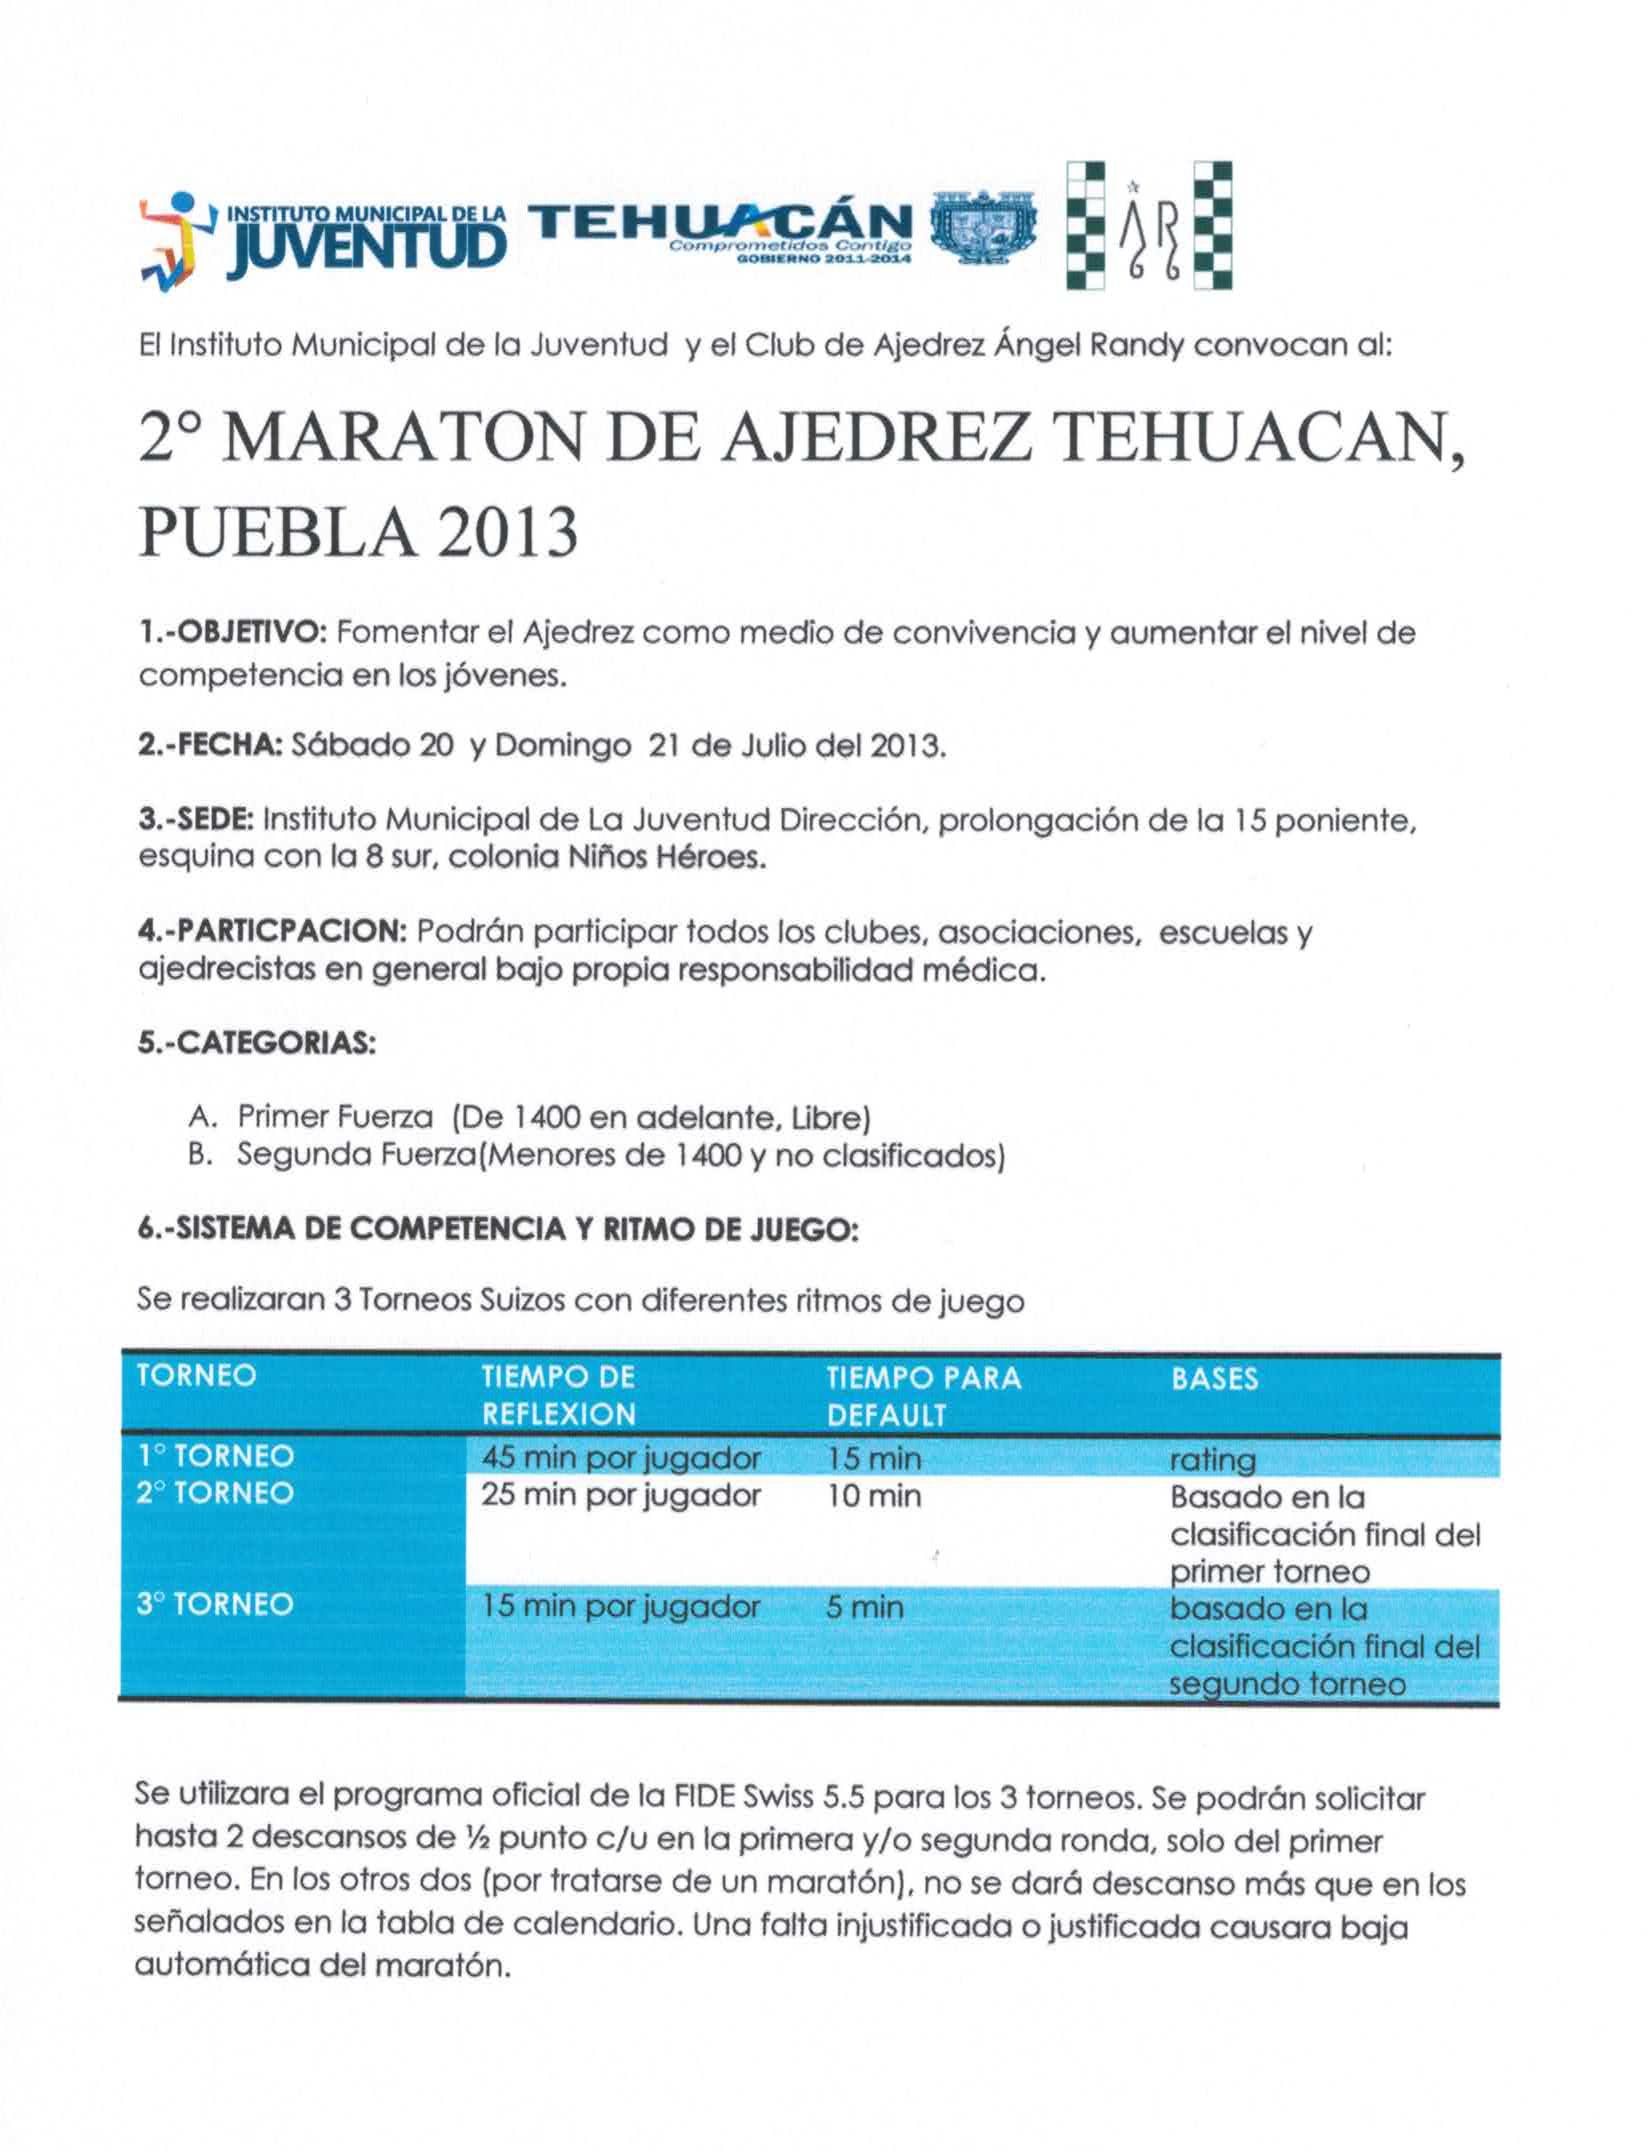 2° MARATON DE AJEDREZ TEHUACAN, PUEBLA